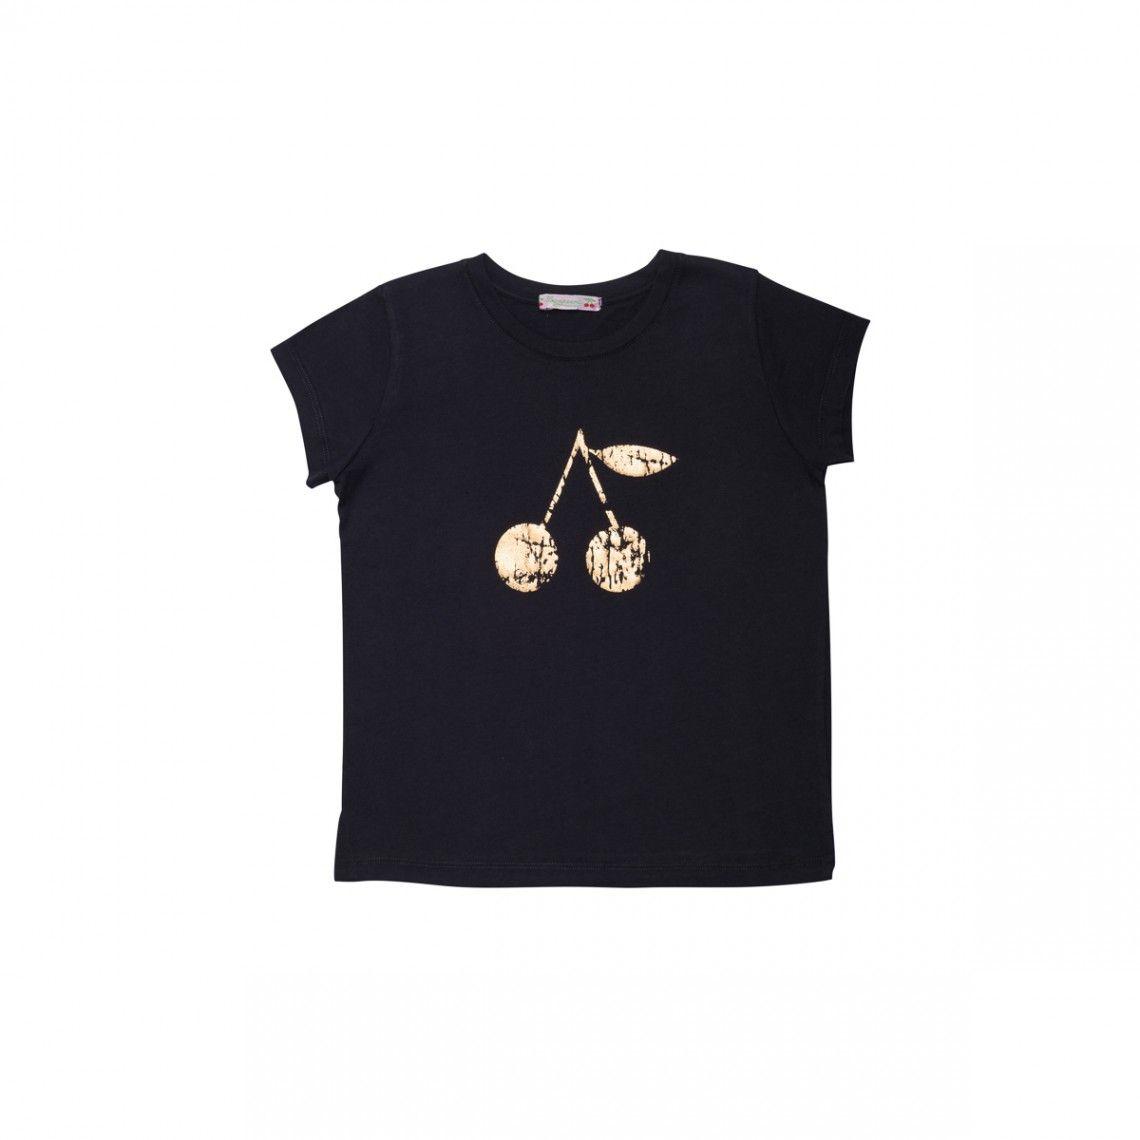 363c5427d Silk Screen T Shirts Printing - DREAMWORKS